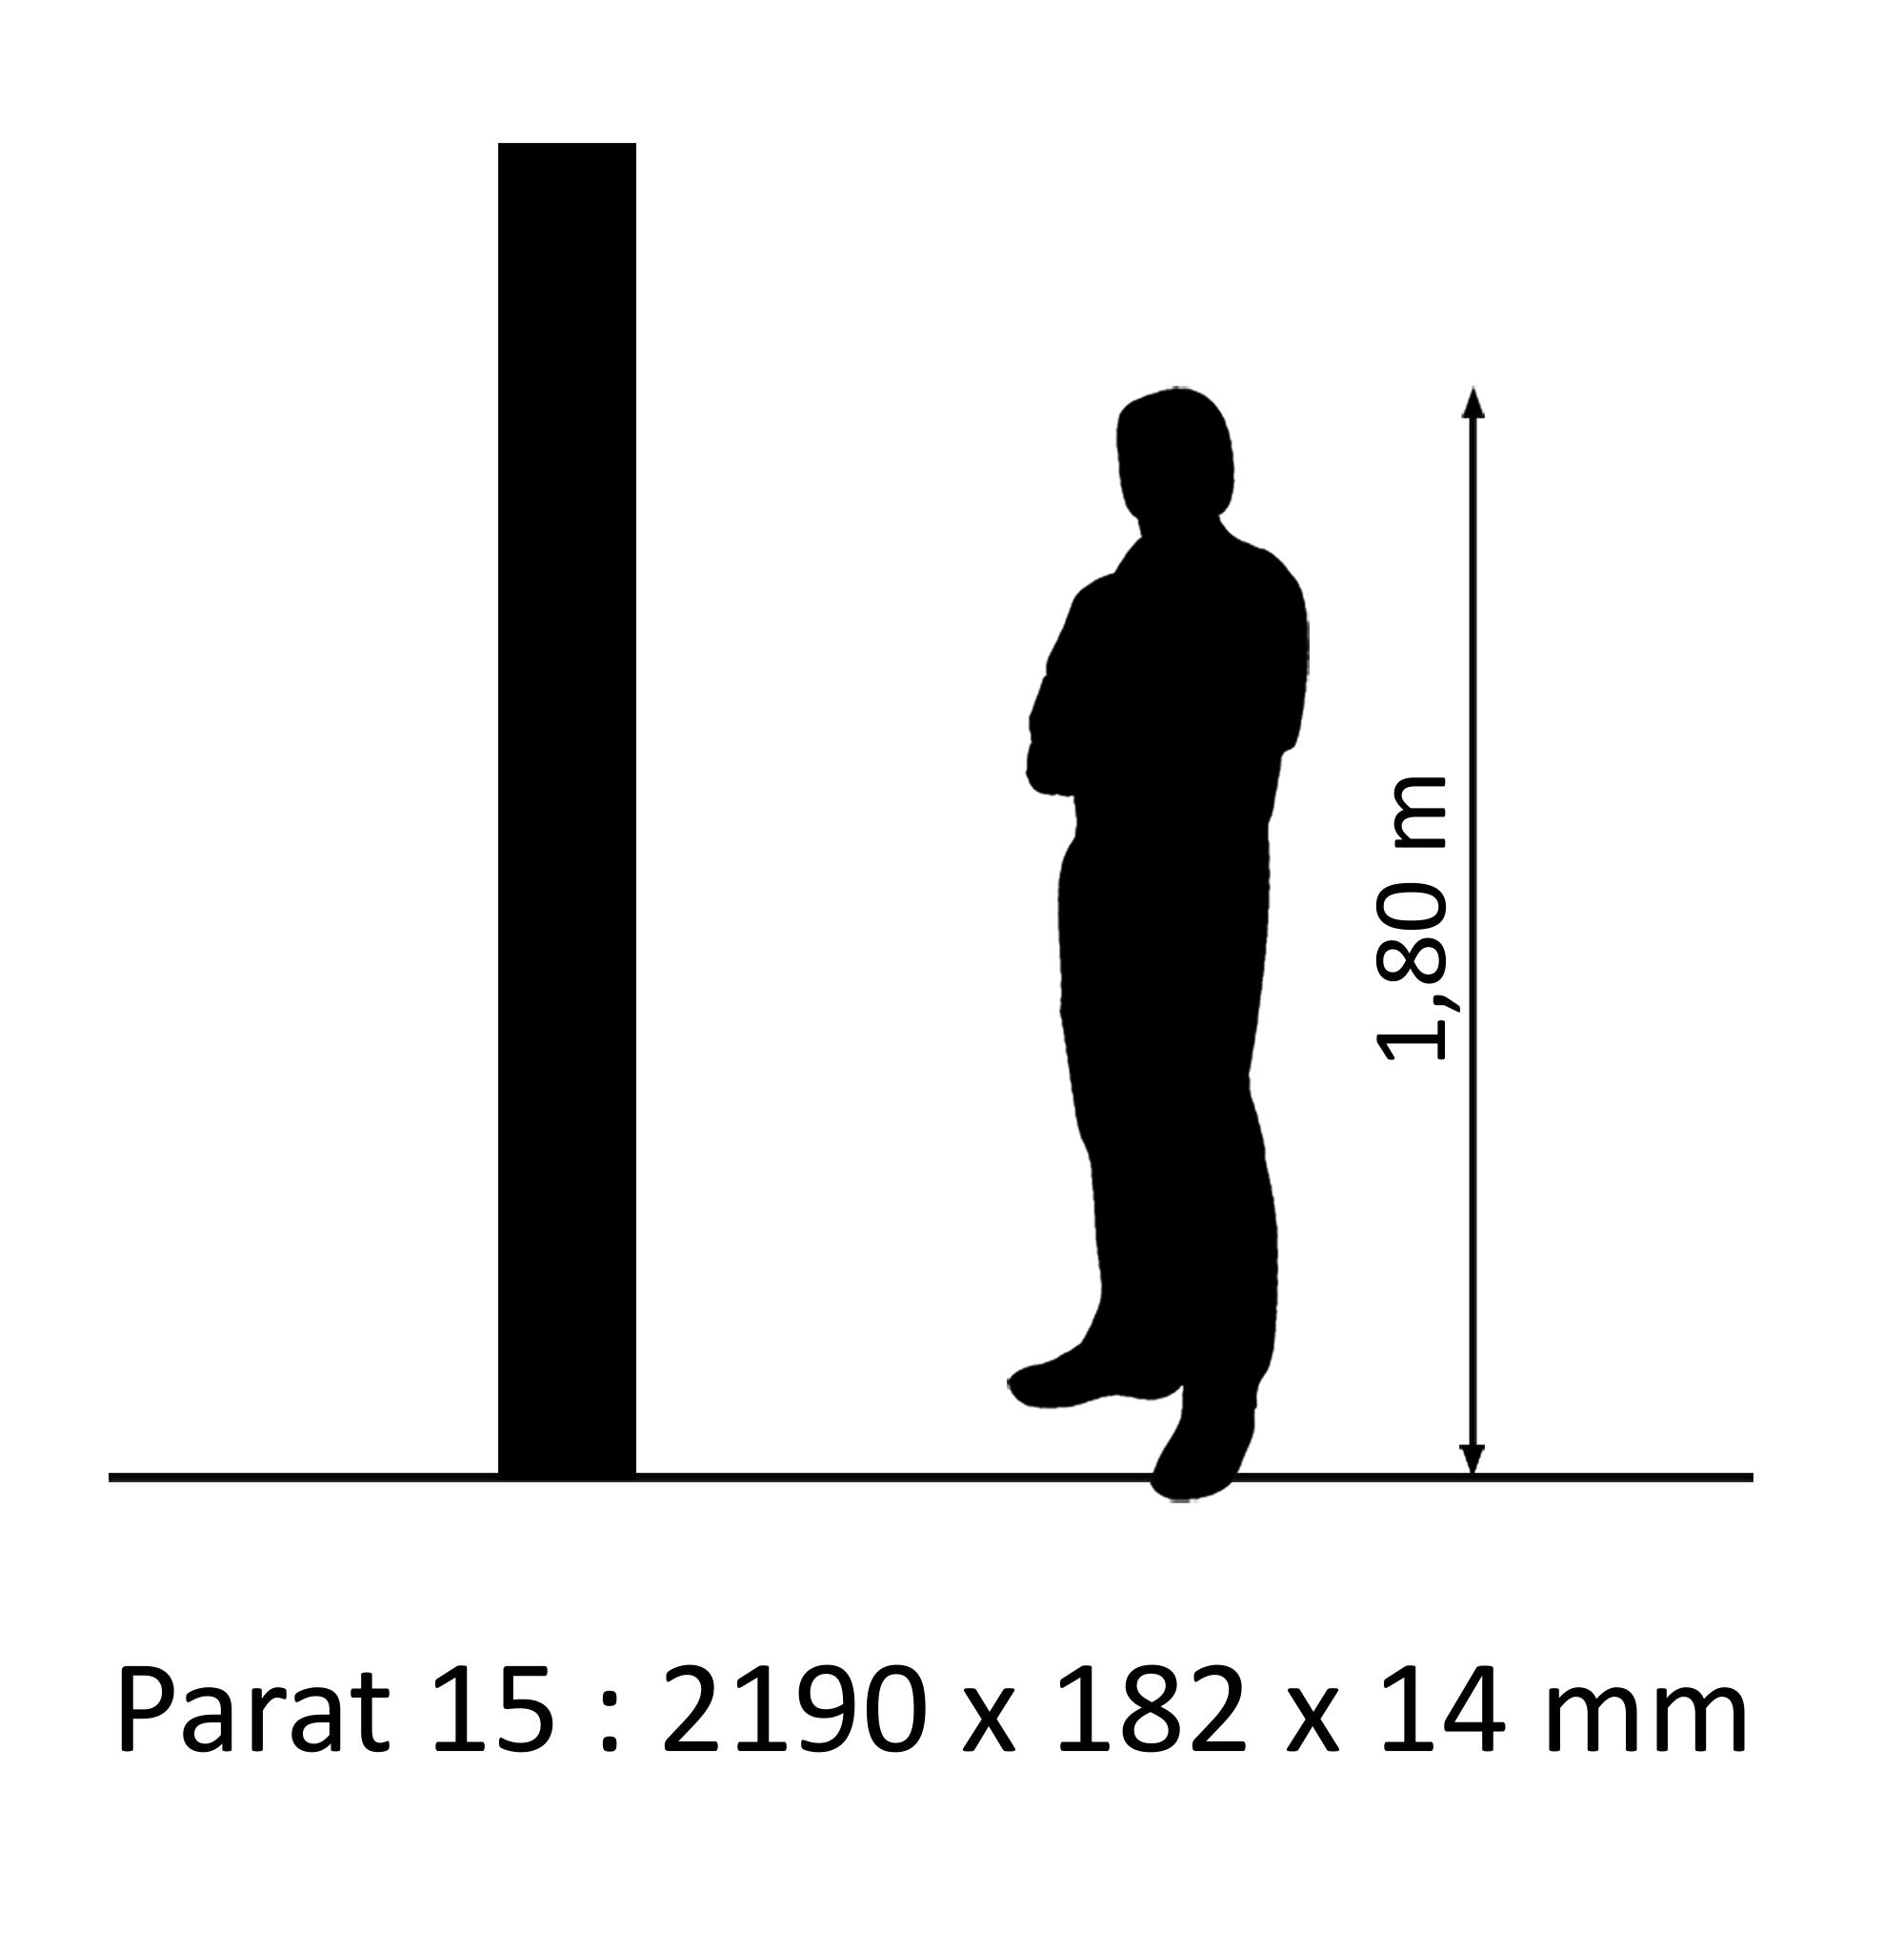 Parat 15 Merbau Trend SB lak 14mm